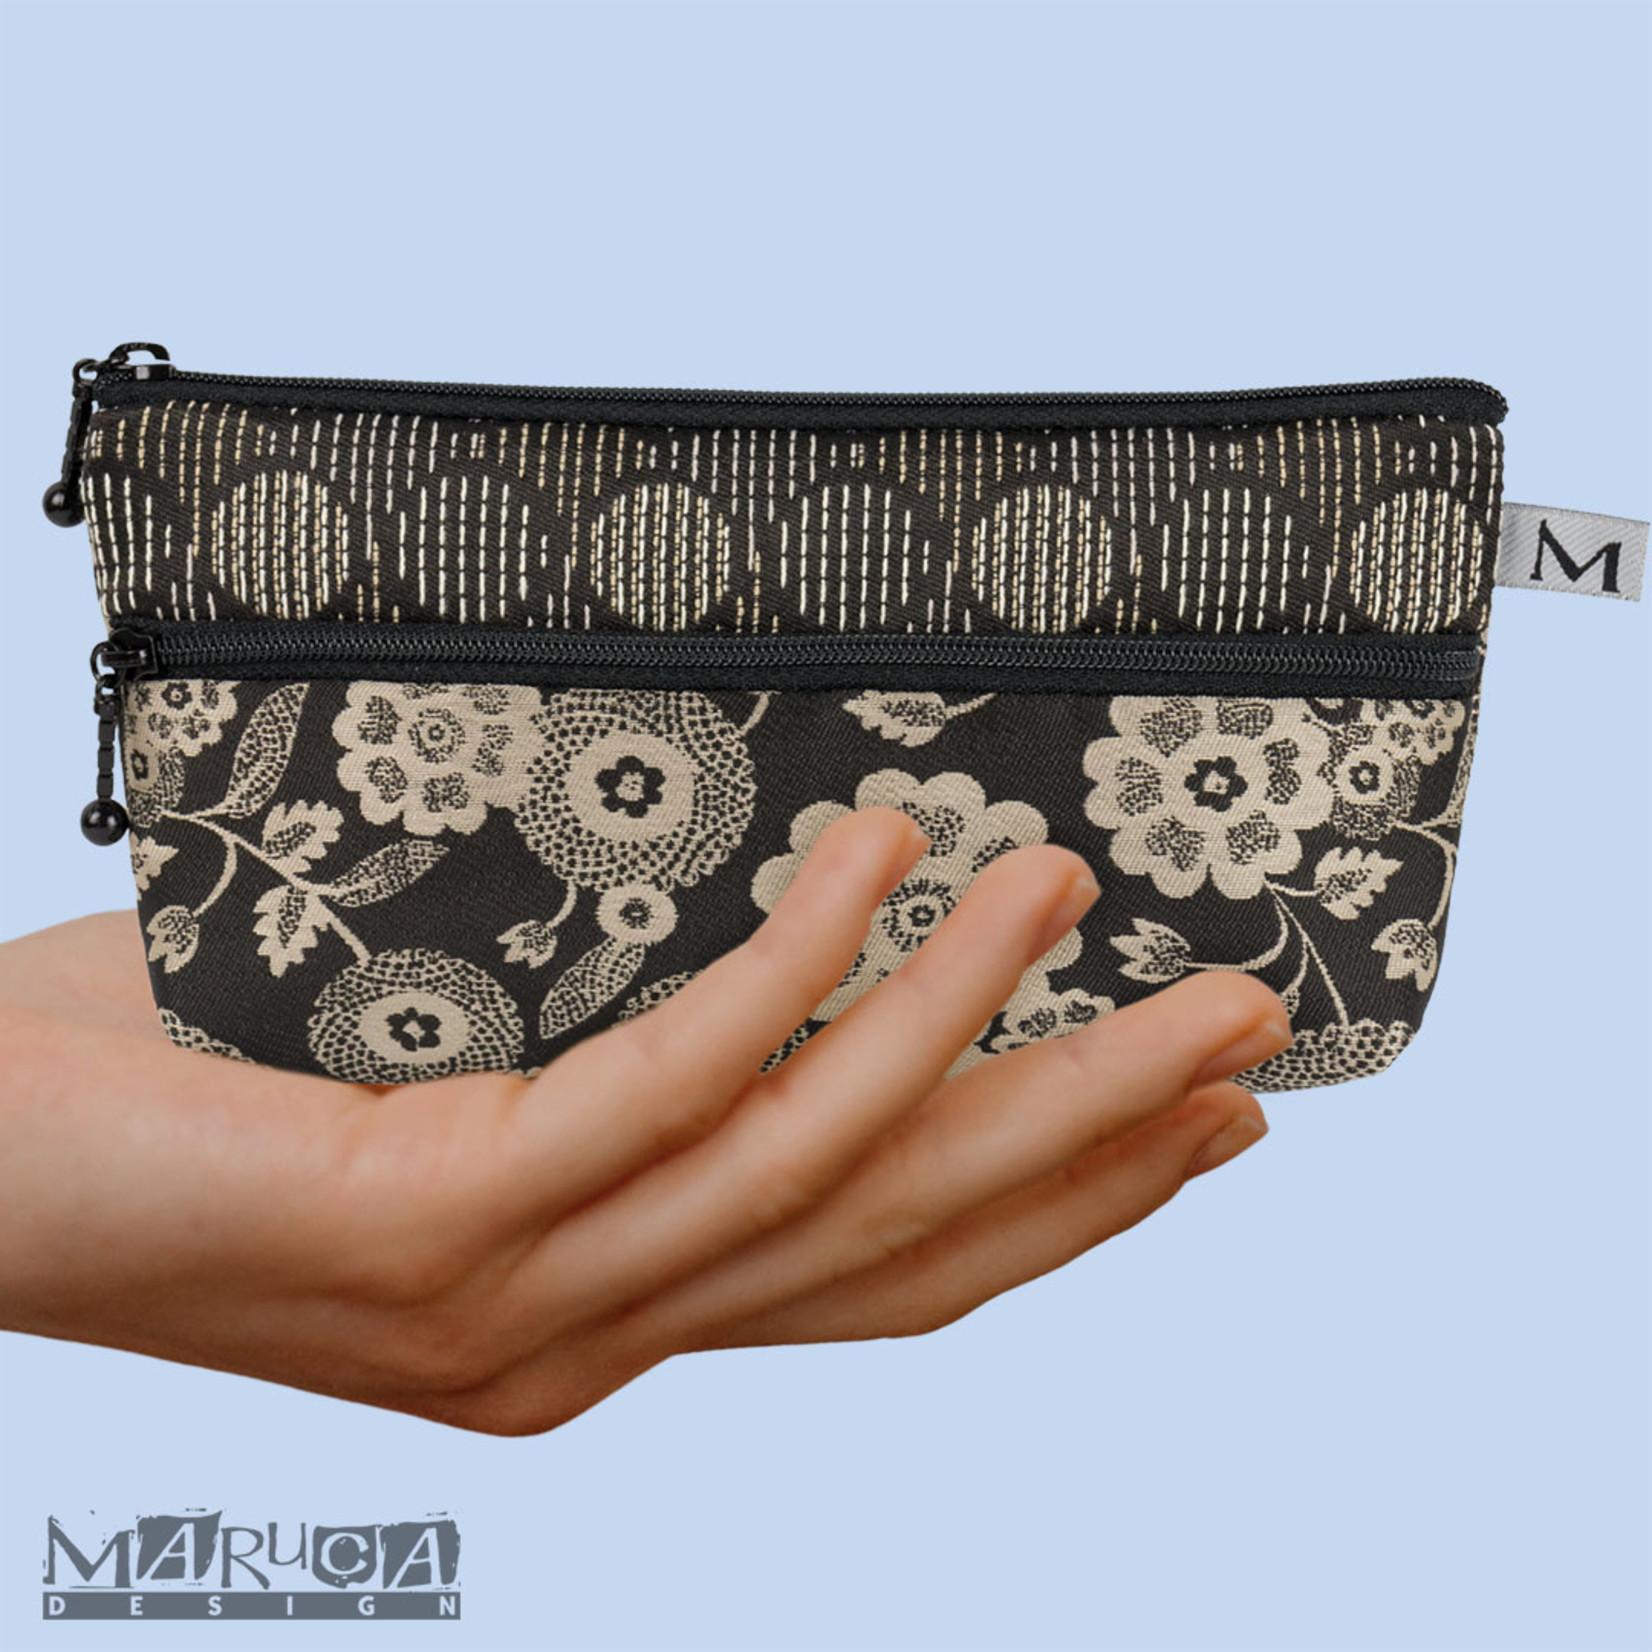 Maruca Heidi Wallet FW21 - Bark Cloth Black